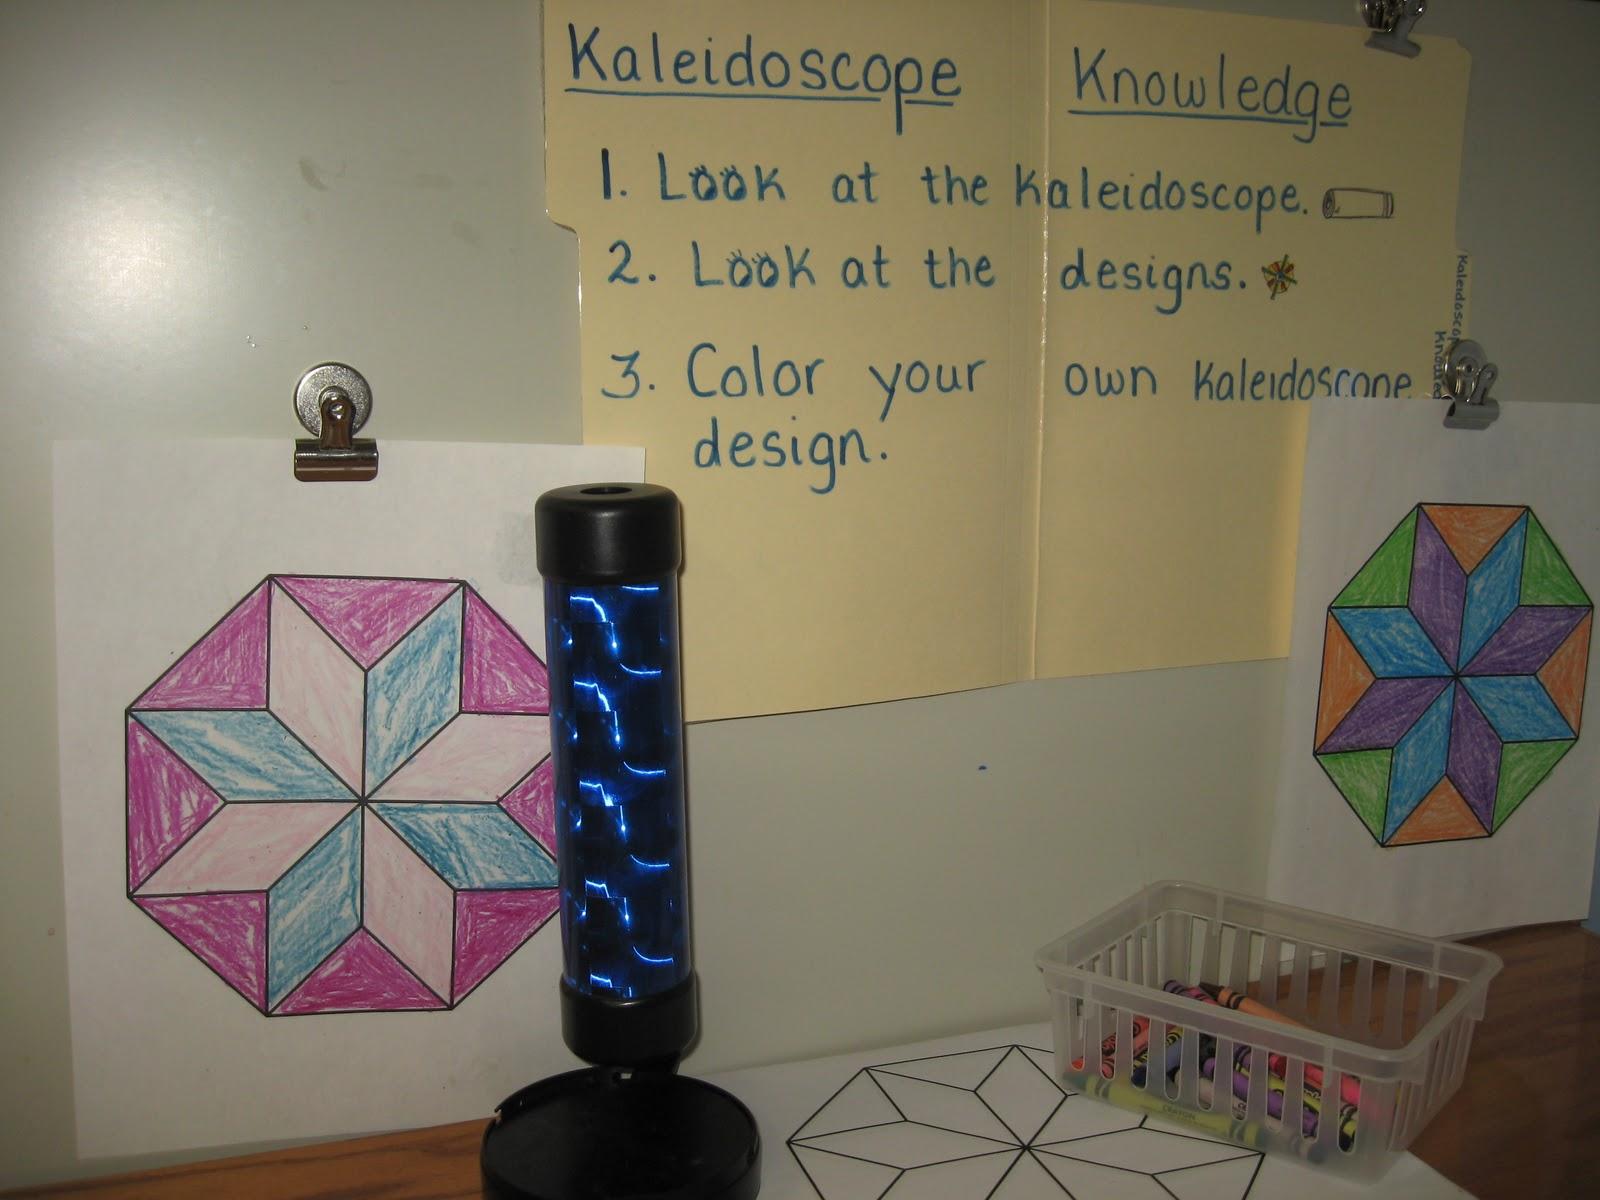 Metamora Community Preschool Kaleidoscope Knowledge